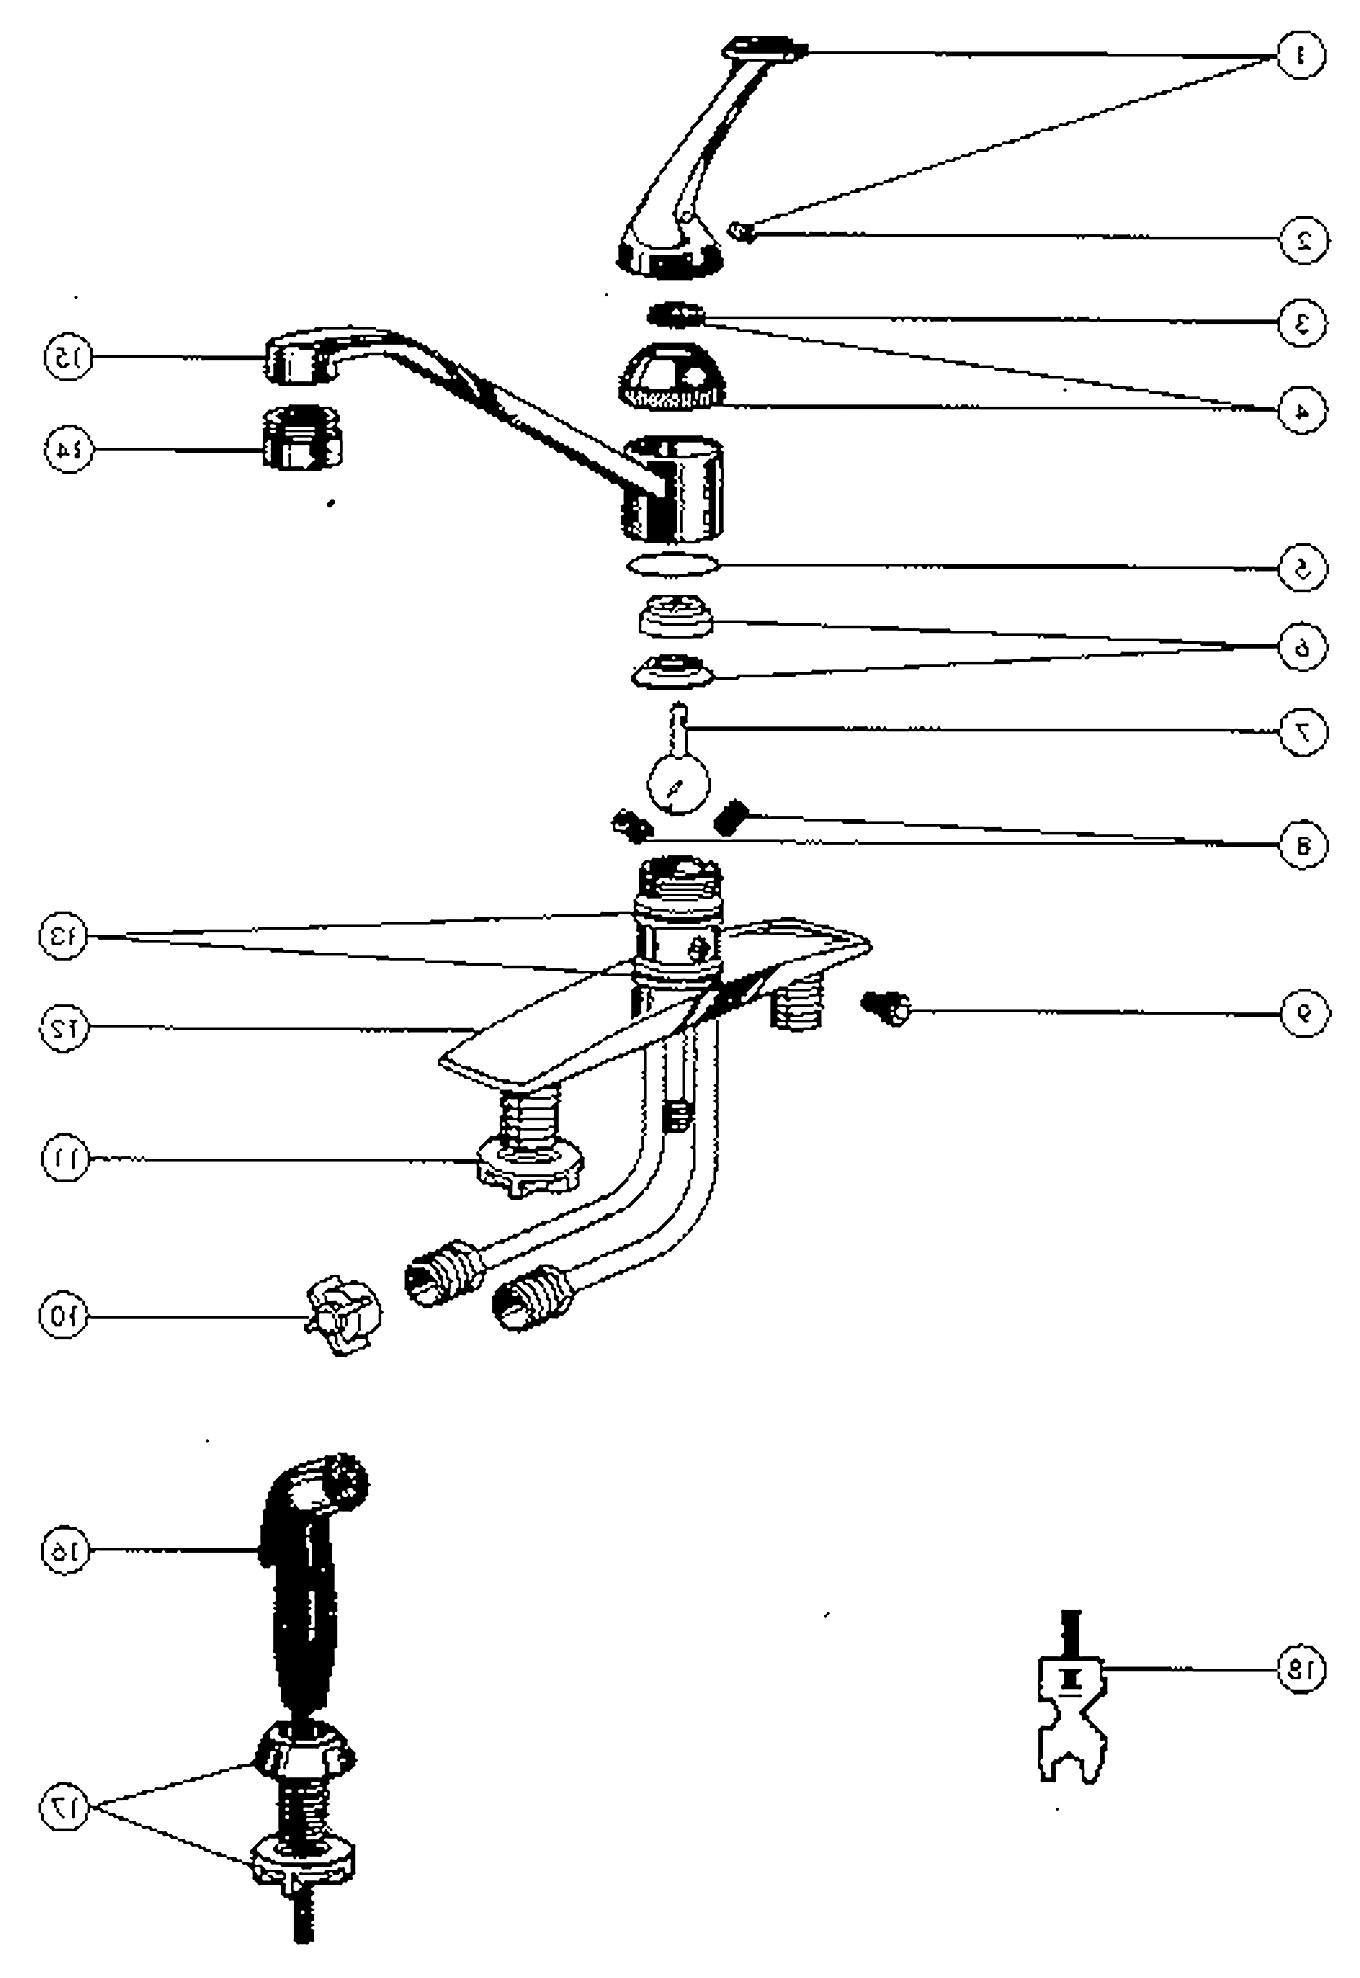 Fire Extinguisher Parts Diagram Incredible Grey Dining Room Design Plus Delta Kitchen Faucet Parts Of Fire Extinguisher Parts Diagram